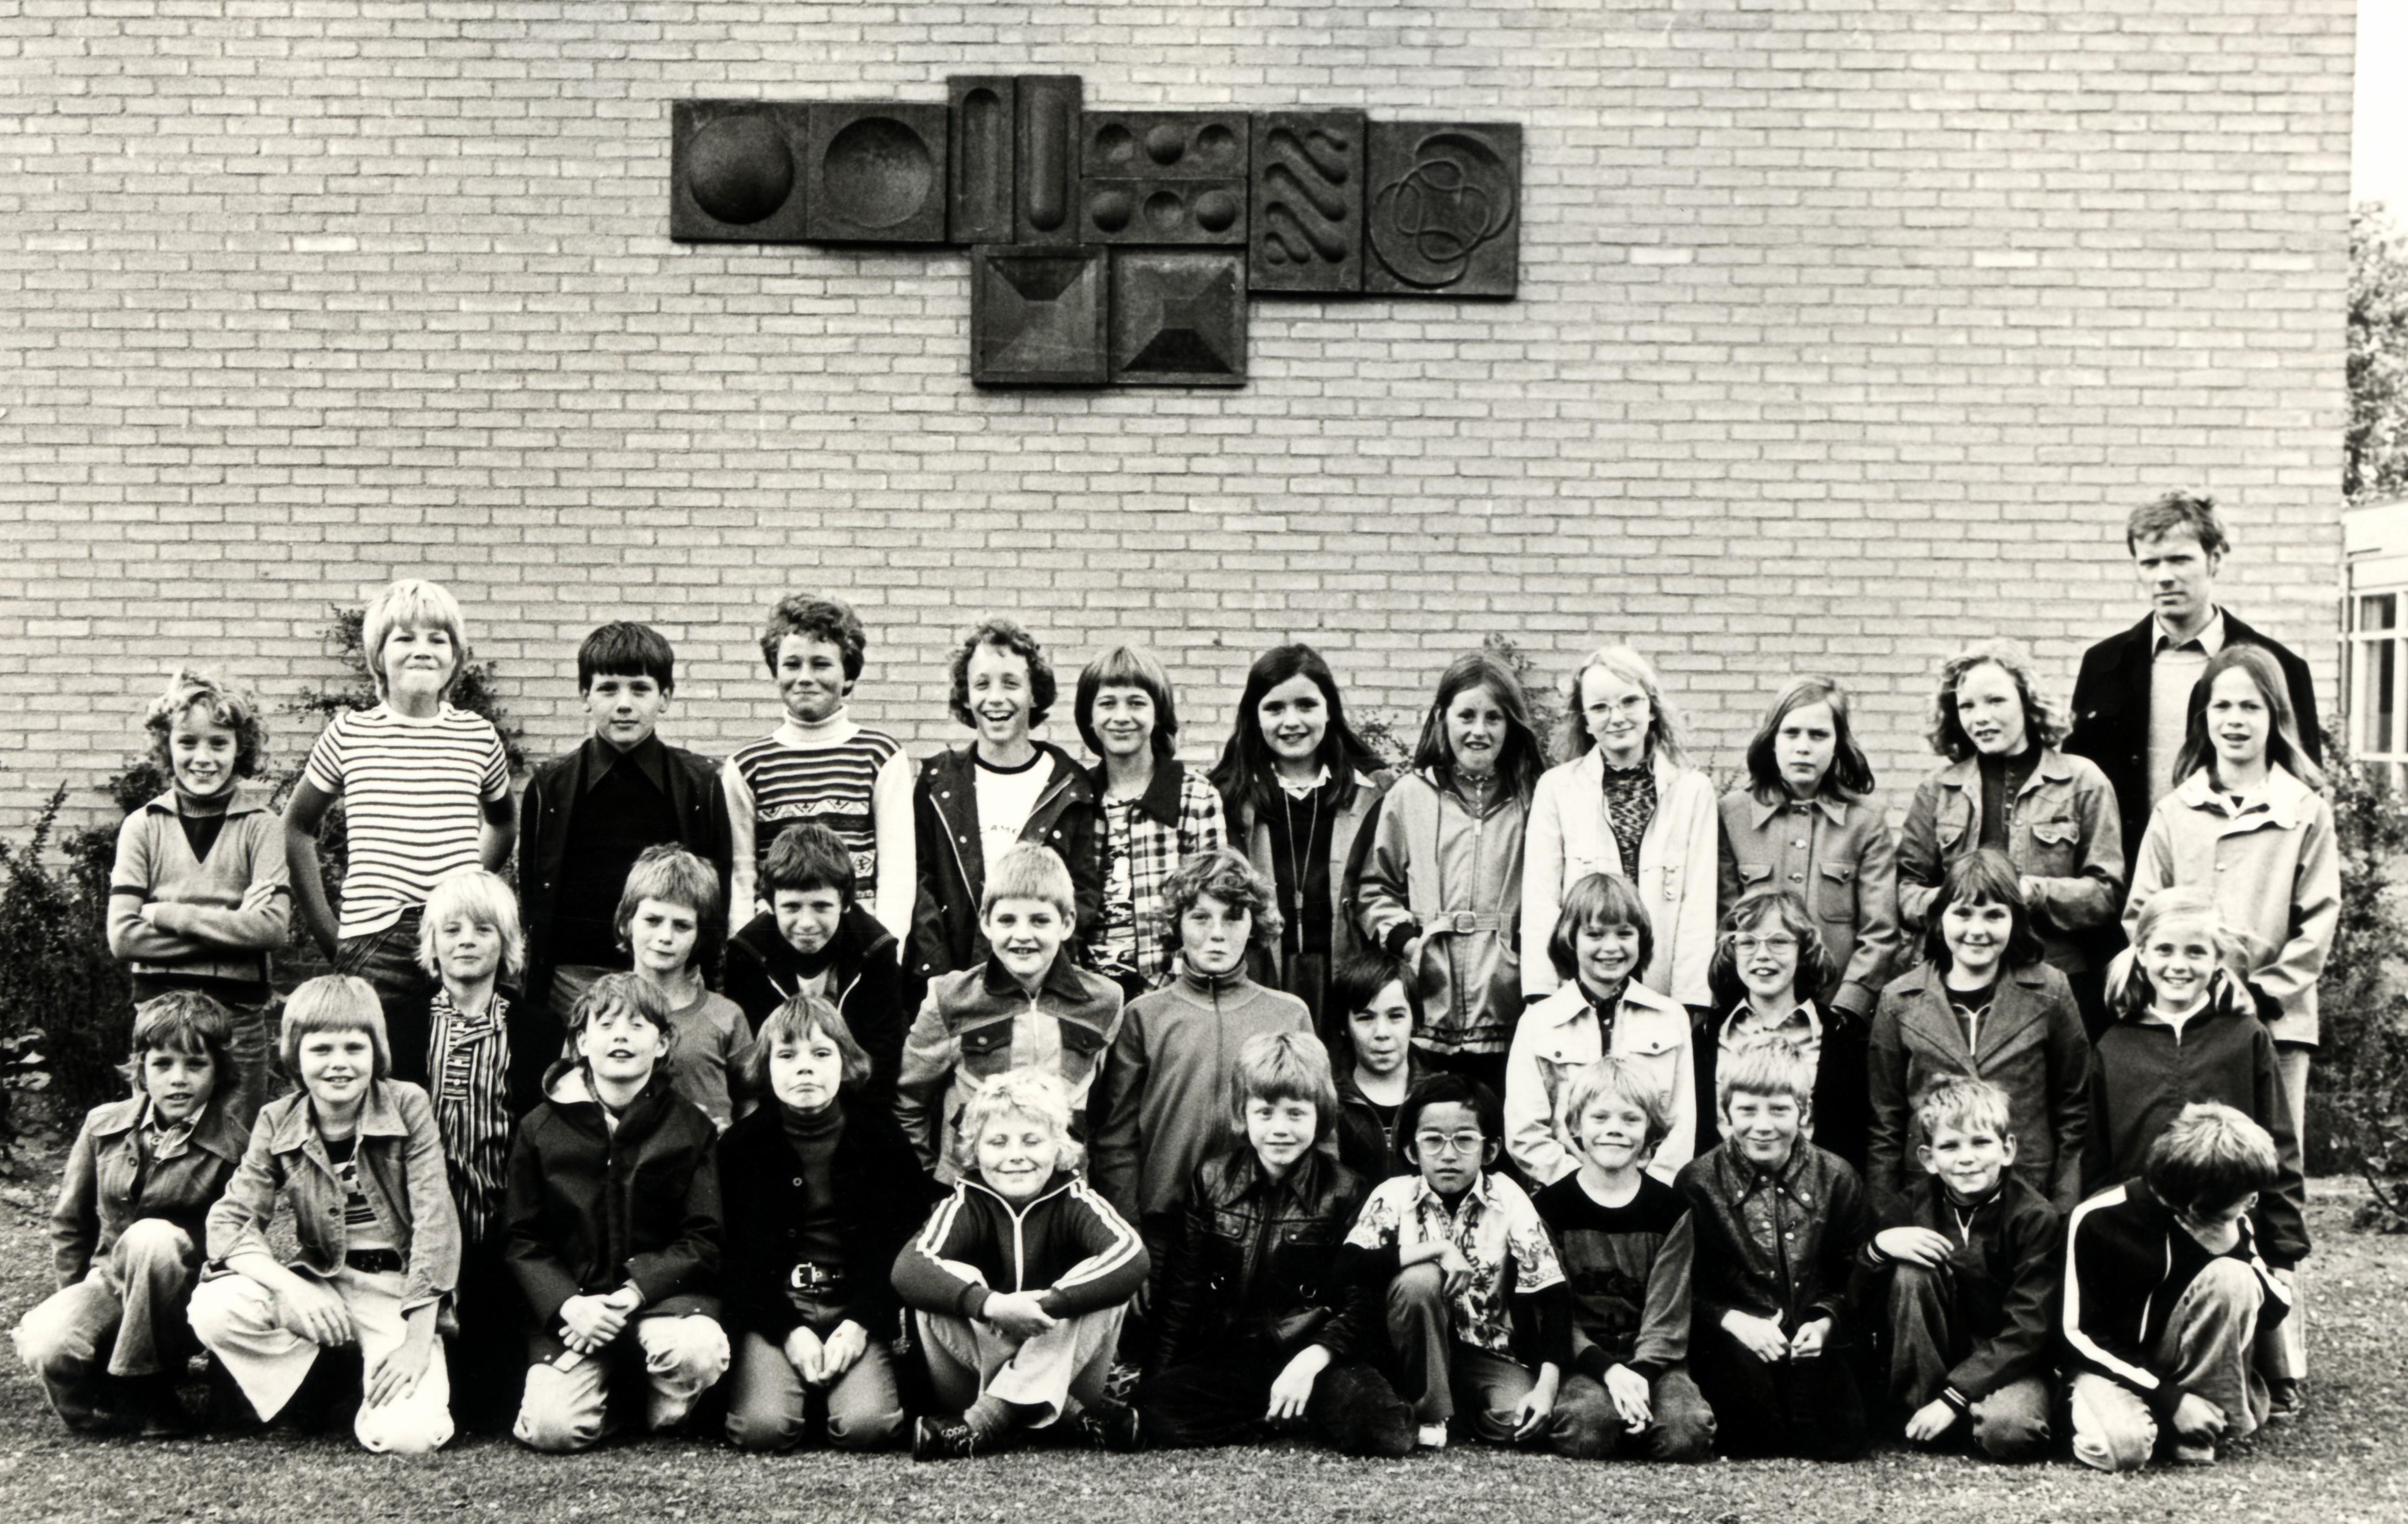 Rotondaschool foto